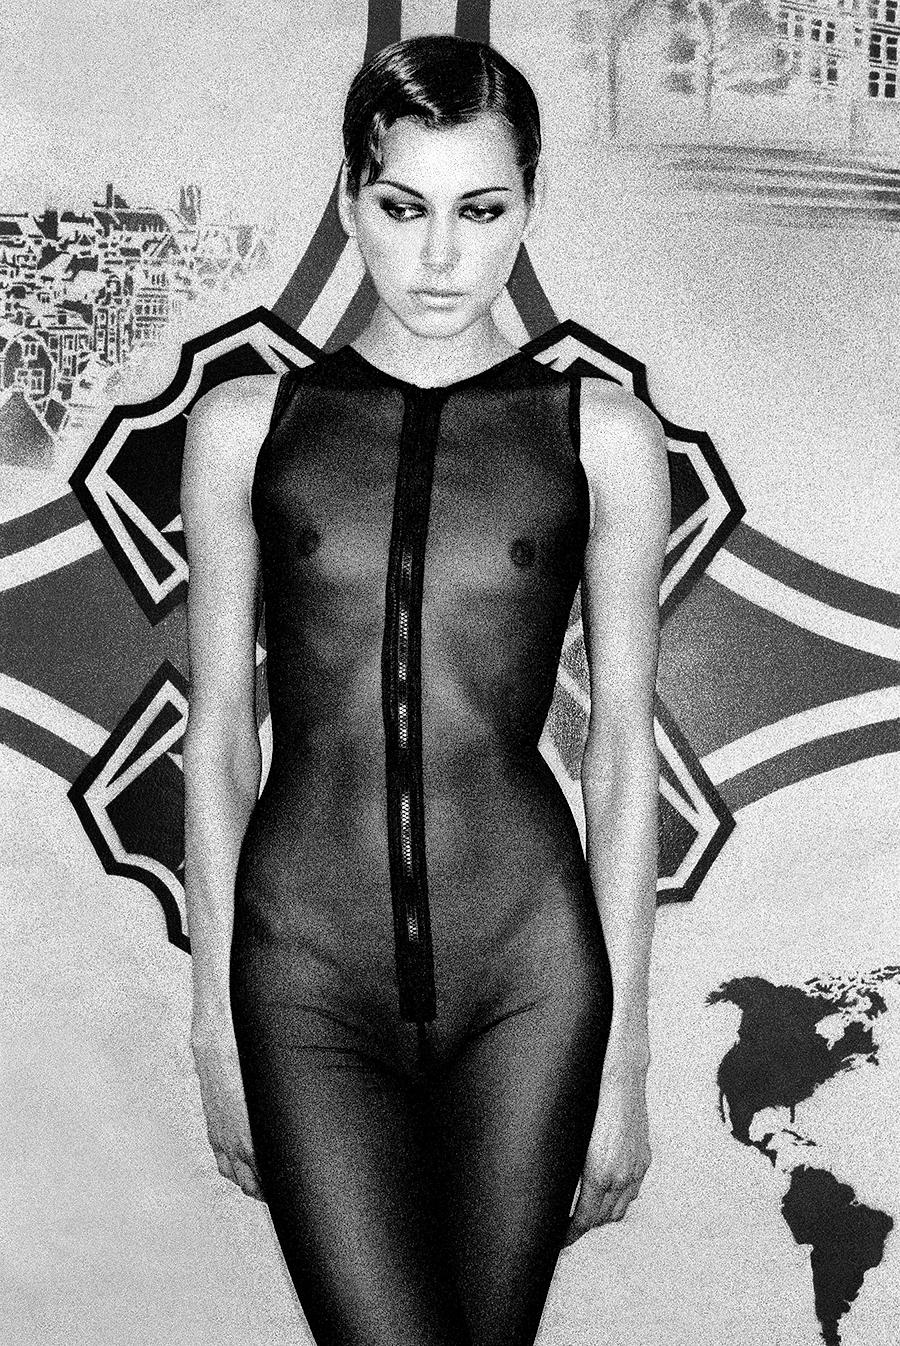 Tony_Ward_fashion_photography_dutch_magazine_blend_hotel_winston